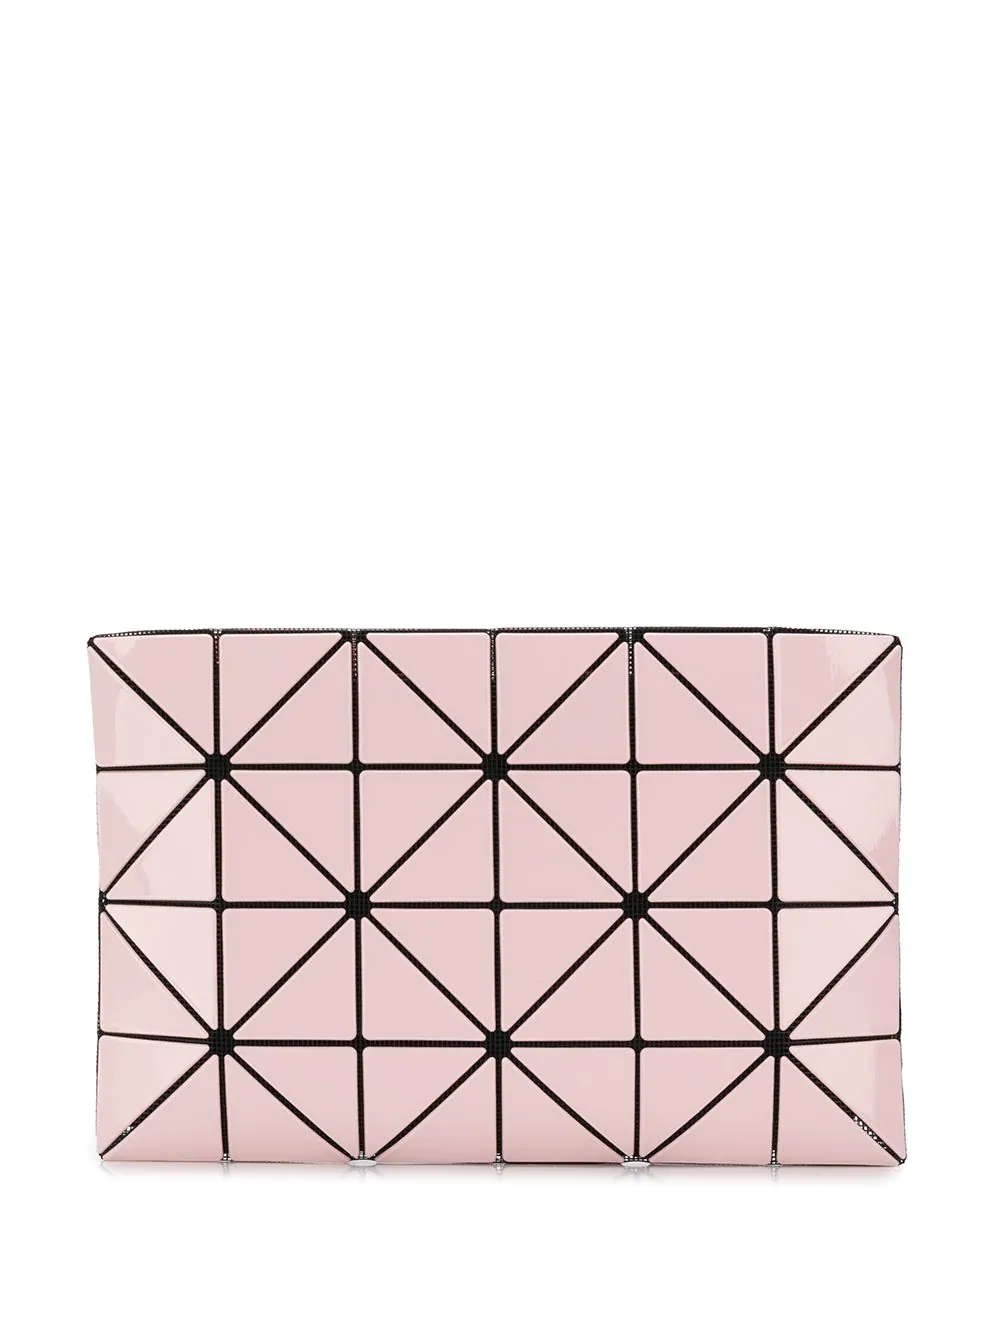 eb4b939ea6 Bao Bao Issey Miyake Prism Clutch Bag - Pink